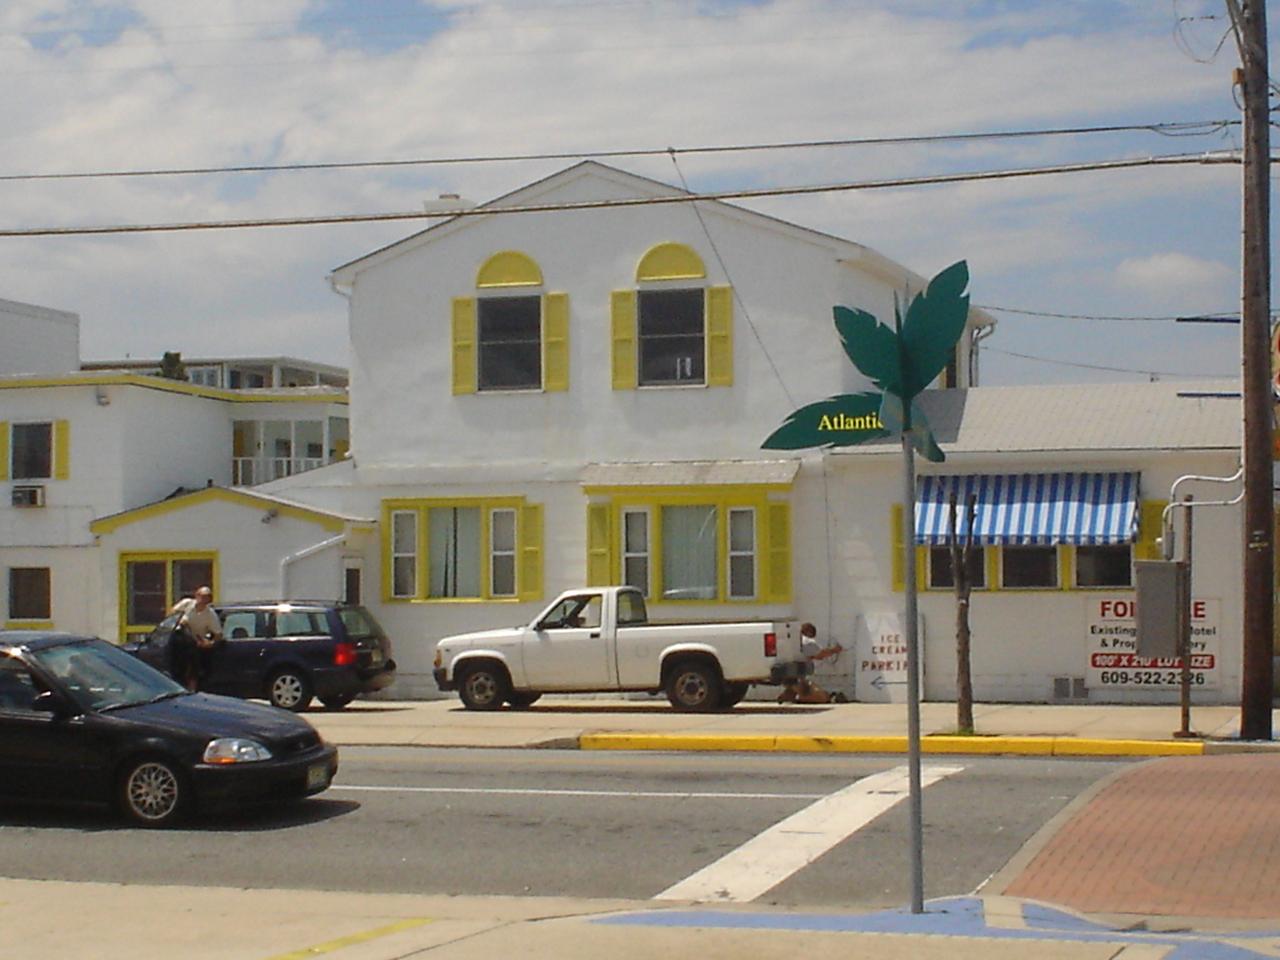 Seashell Motel